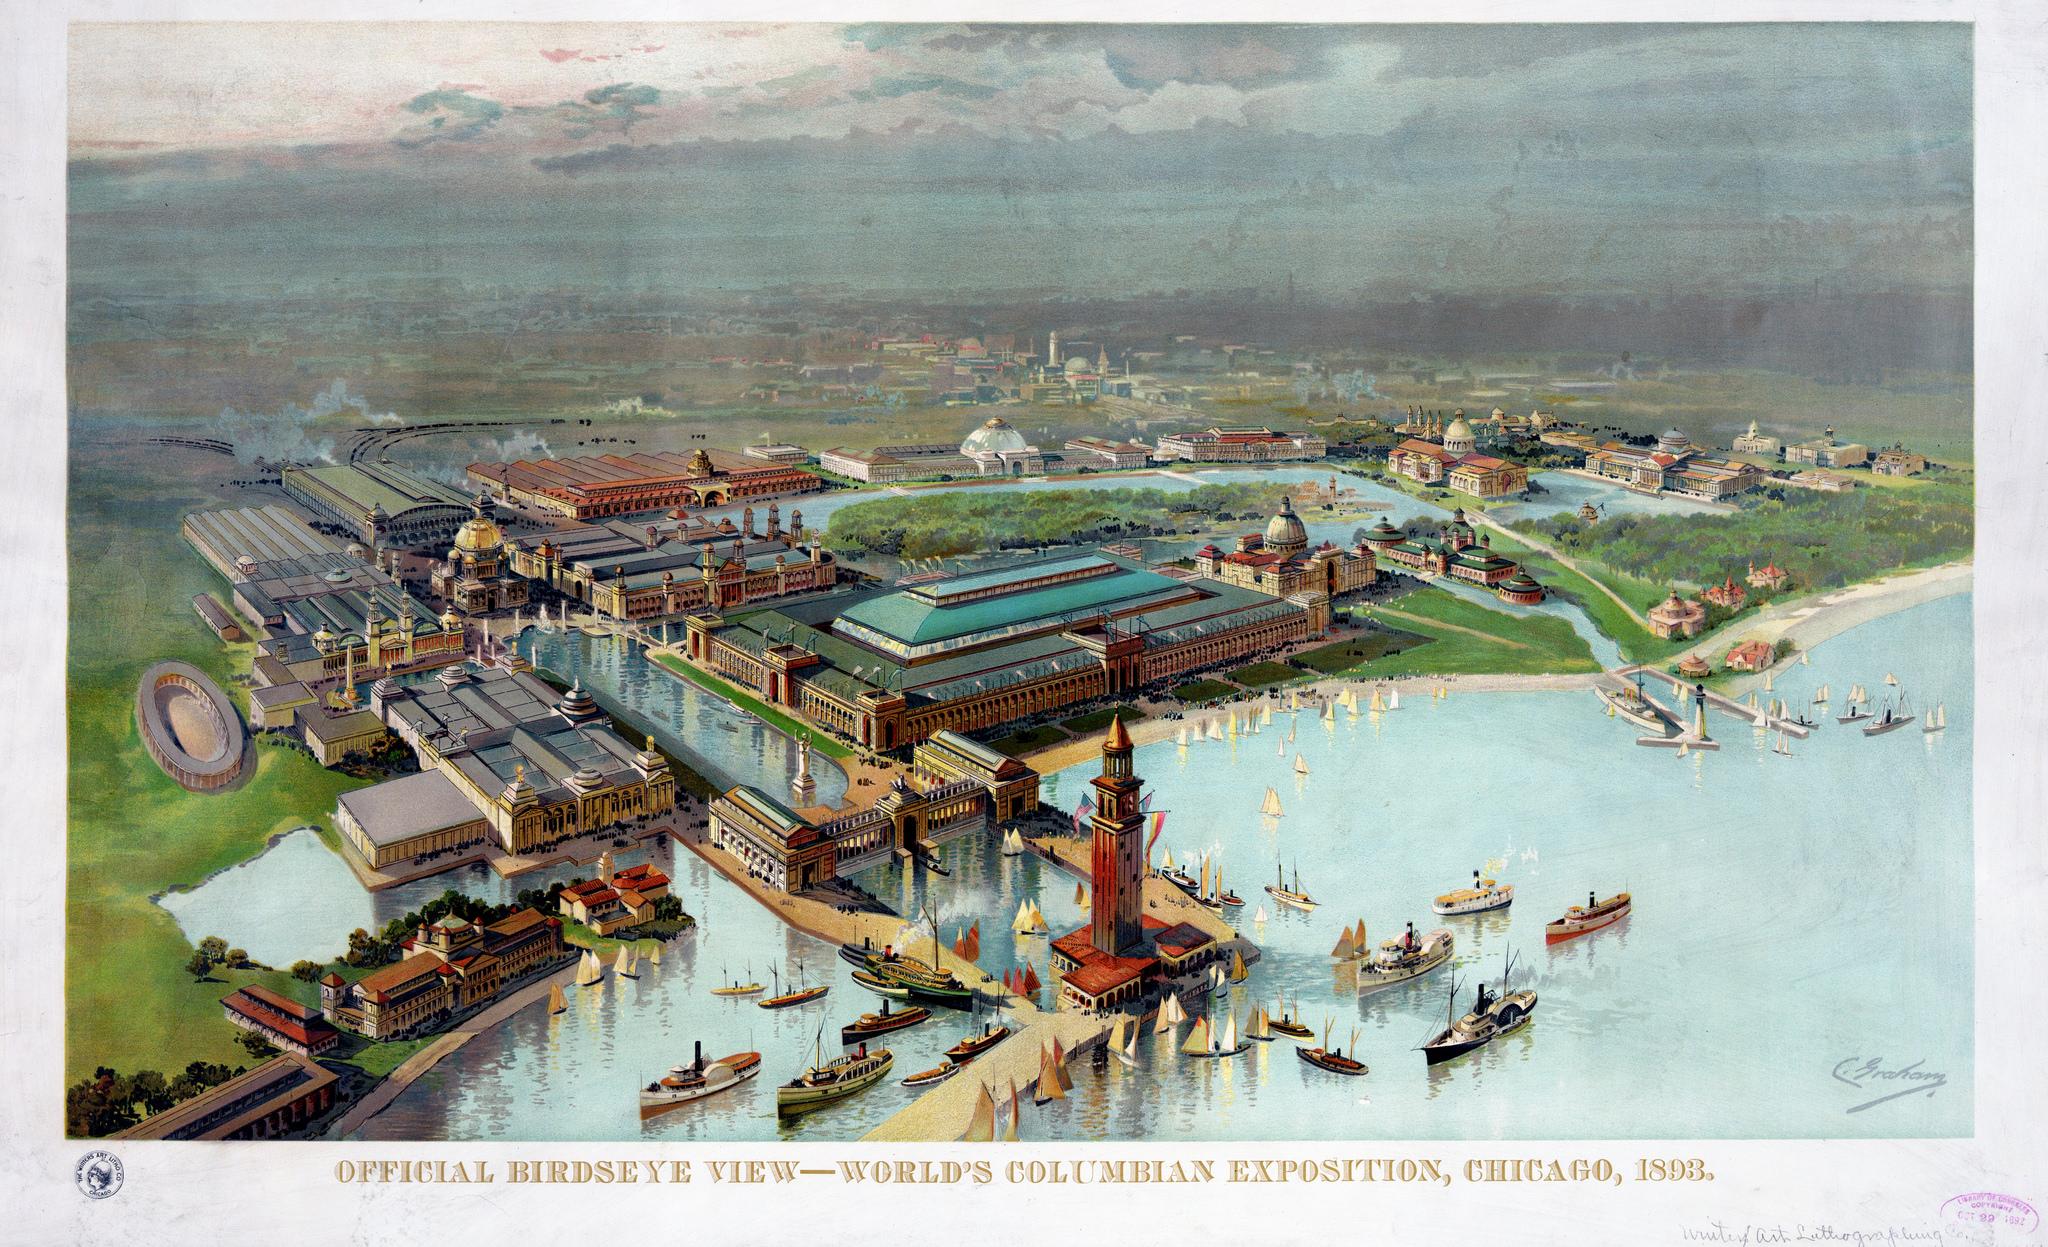 Bird's-eye-view of the 1893 World's Fair Exposition (image via Stuart Rankin / Flickr)